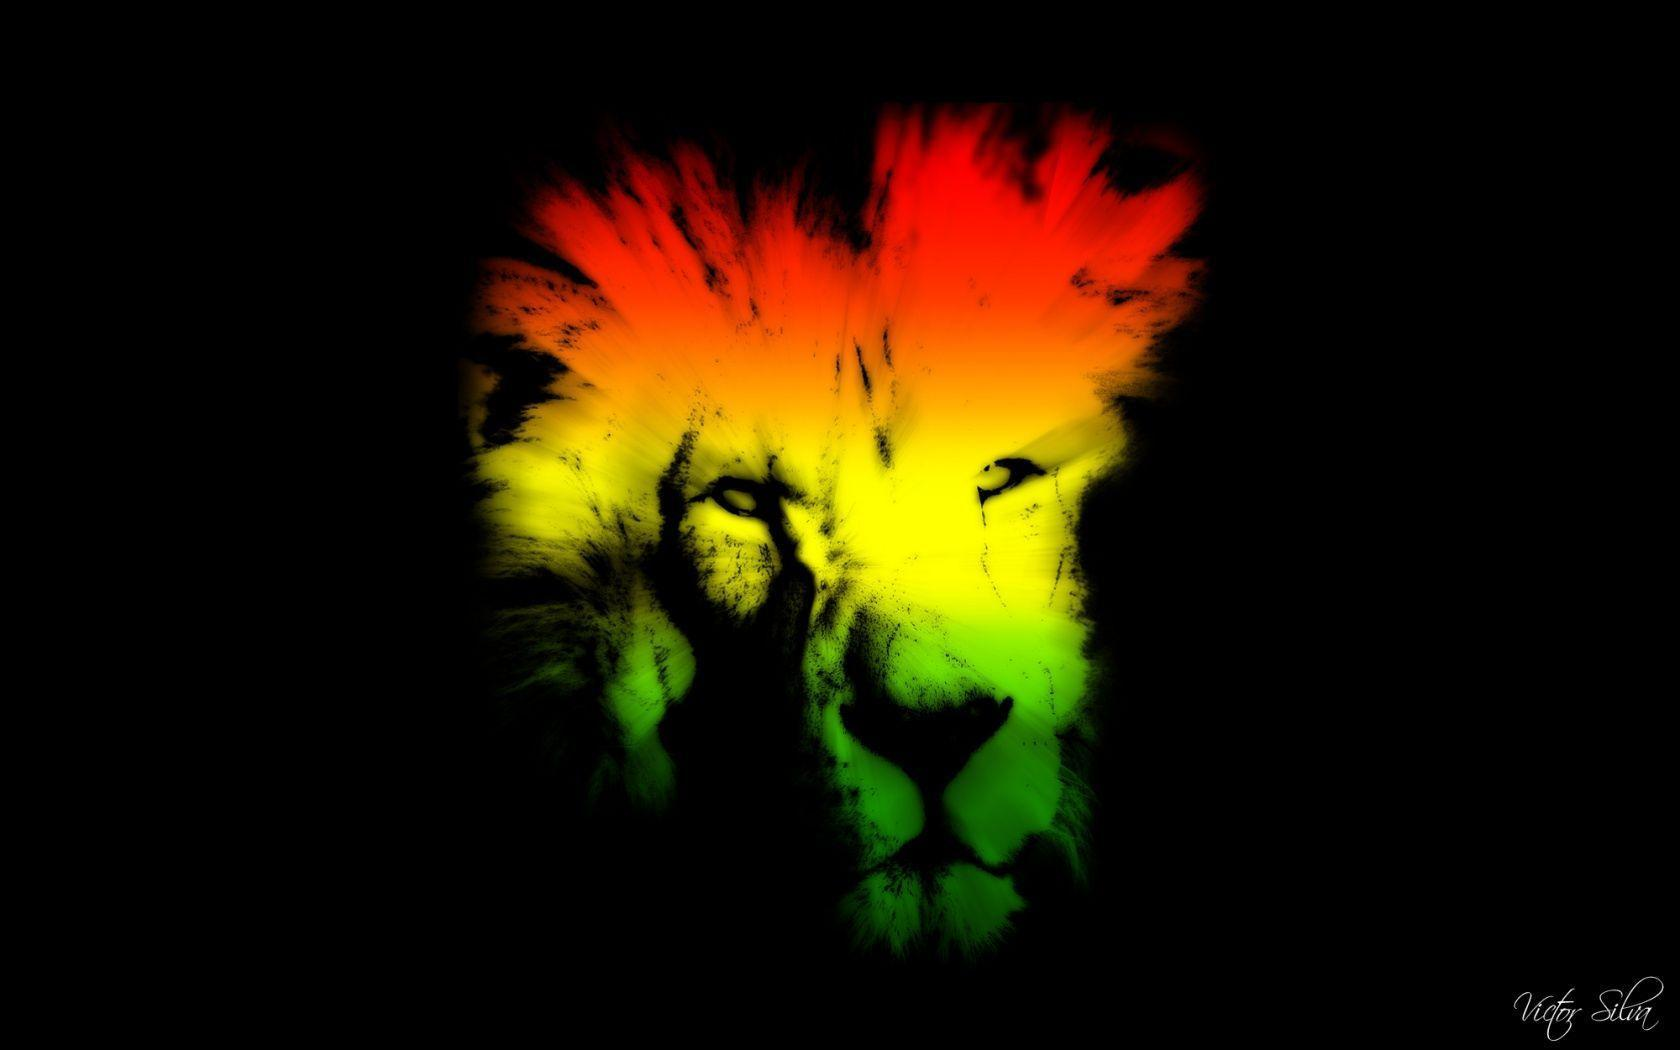 rastafarian lion wallpaper - photo #17